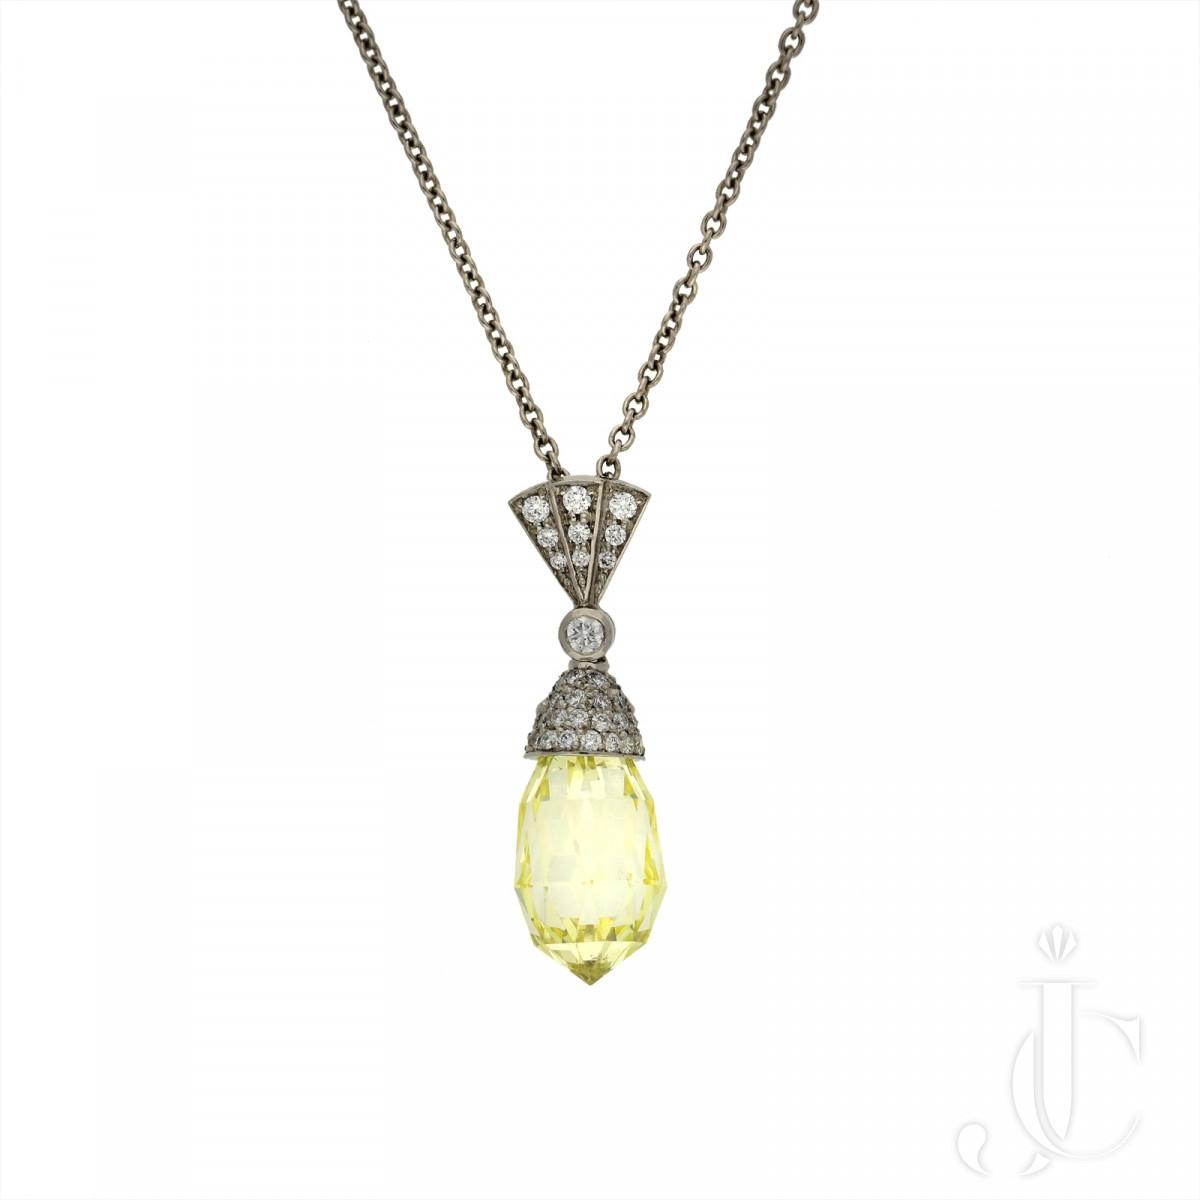 4.50ct Fancy Yellow Briolette Diamond pendant